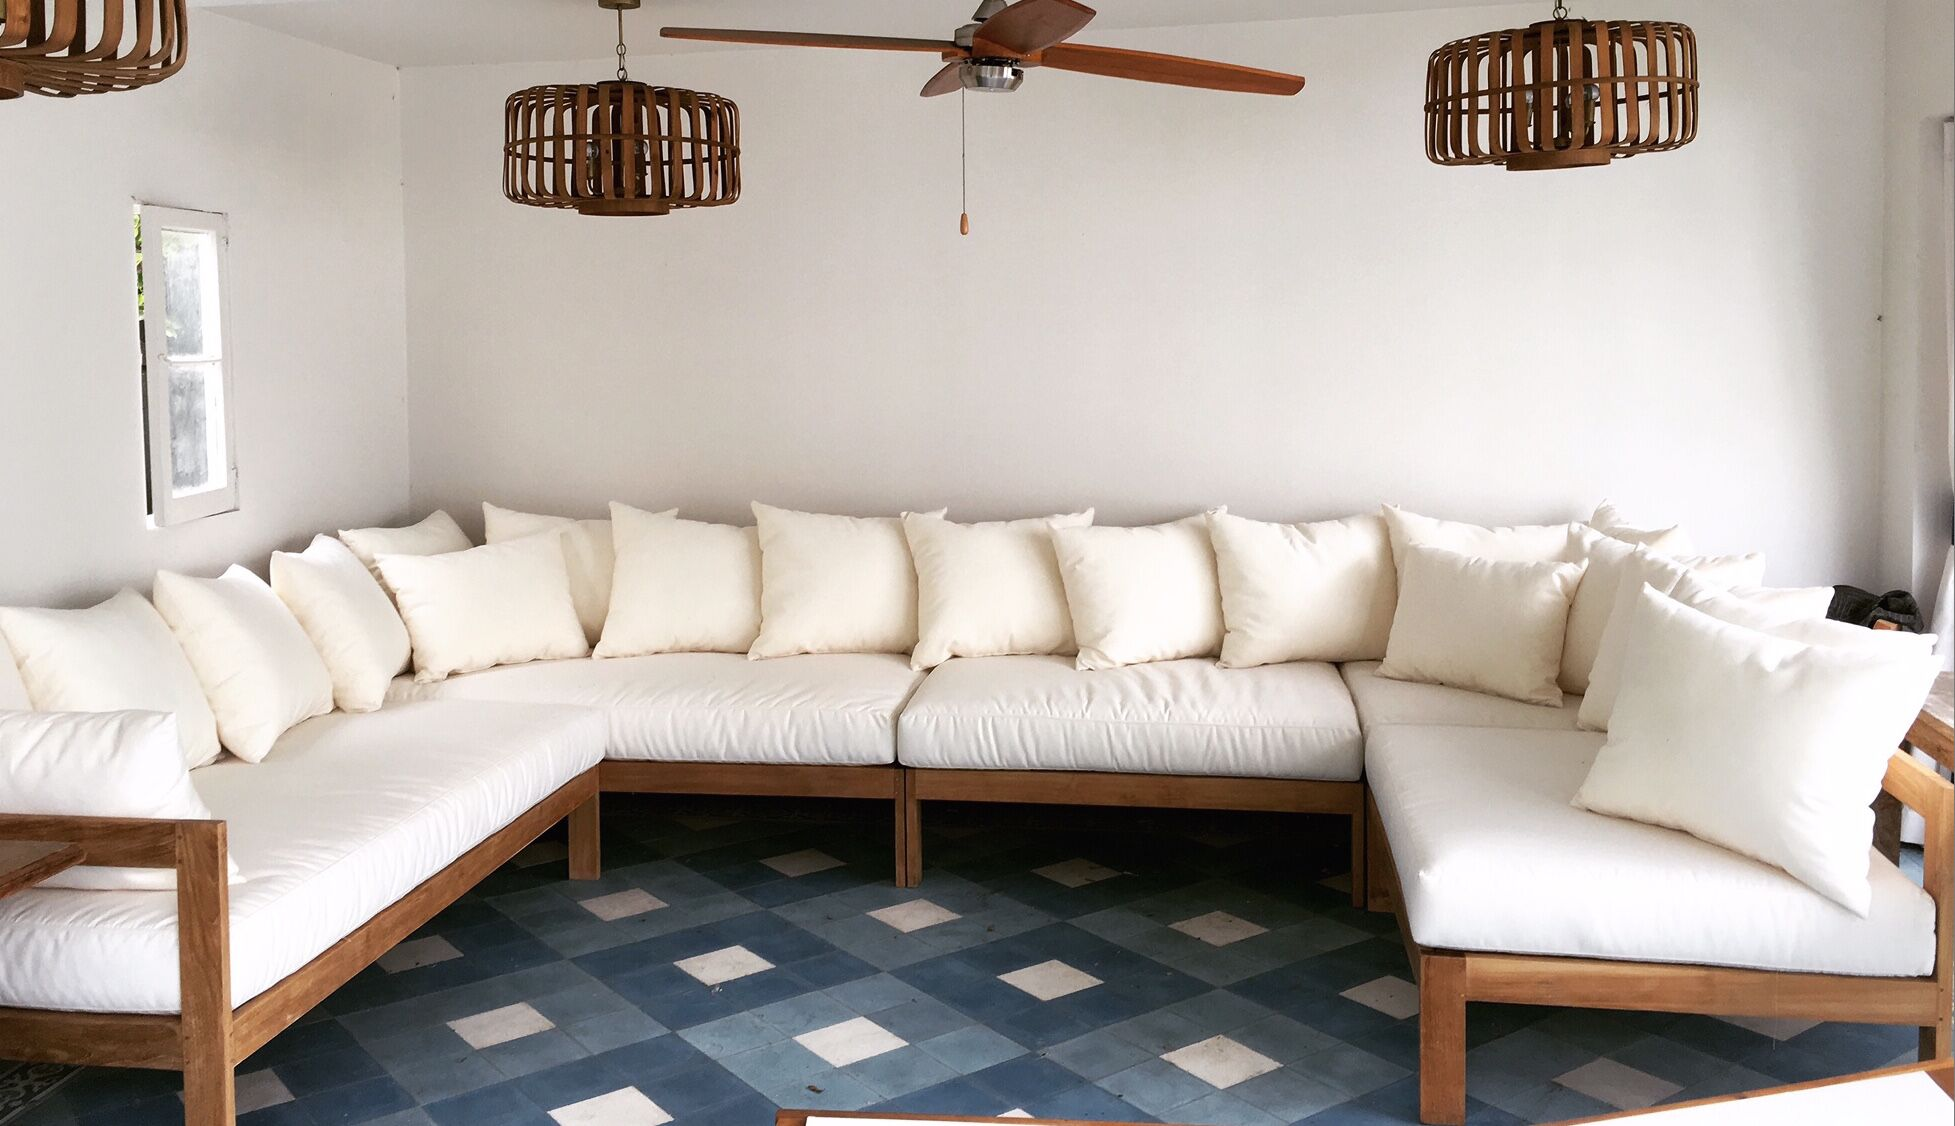 Manhattan 5 Piece Teak Sunbrella Sectional Set with Cushions Fabric: Charcoal